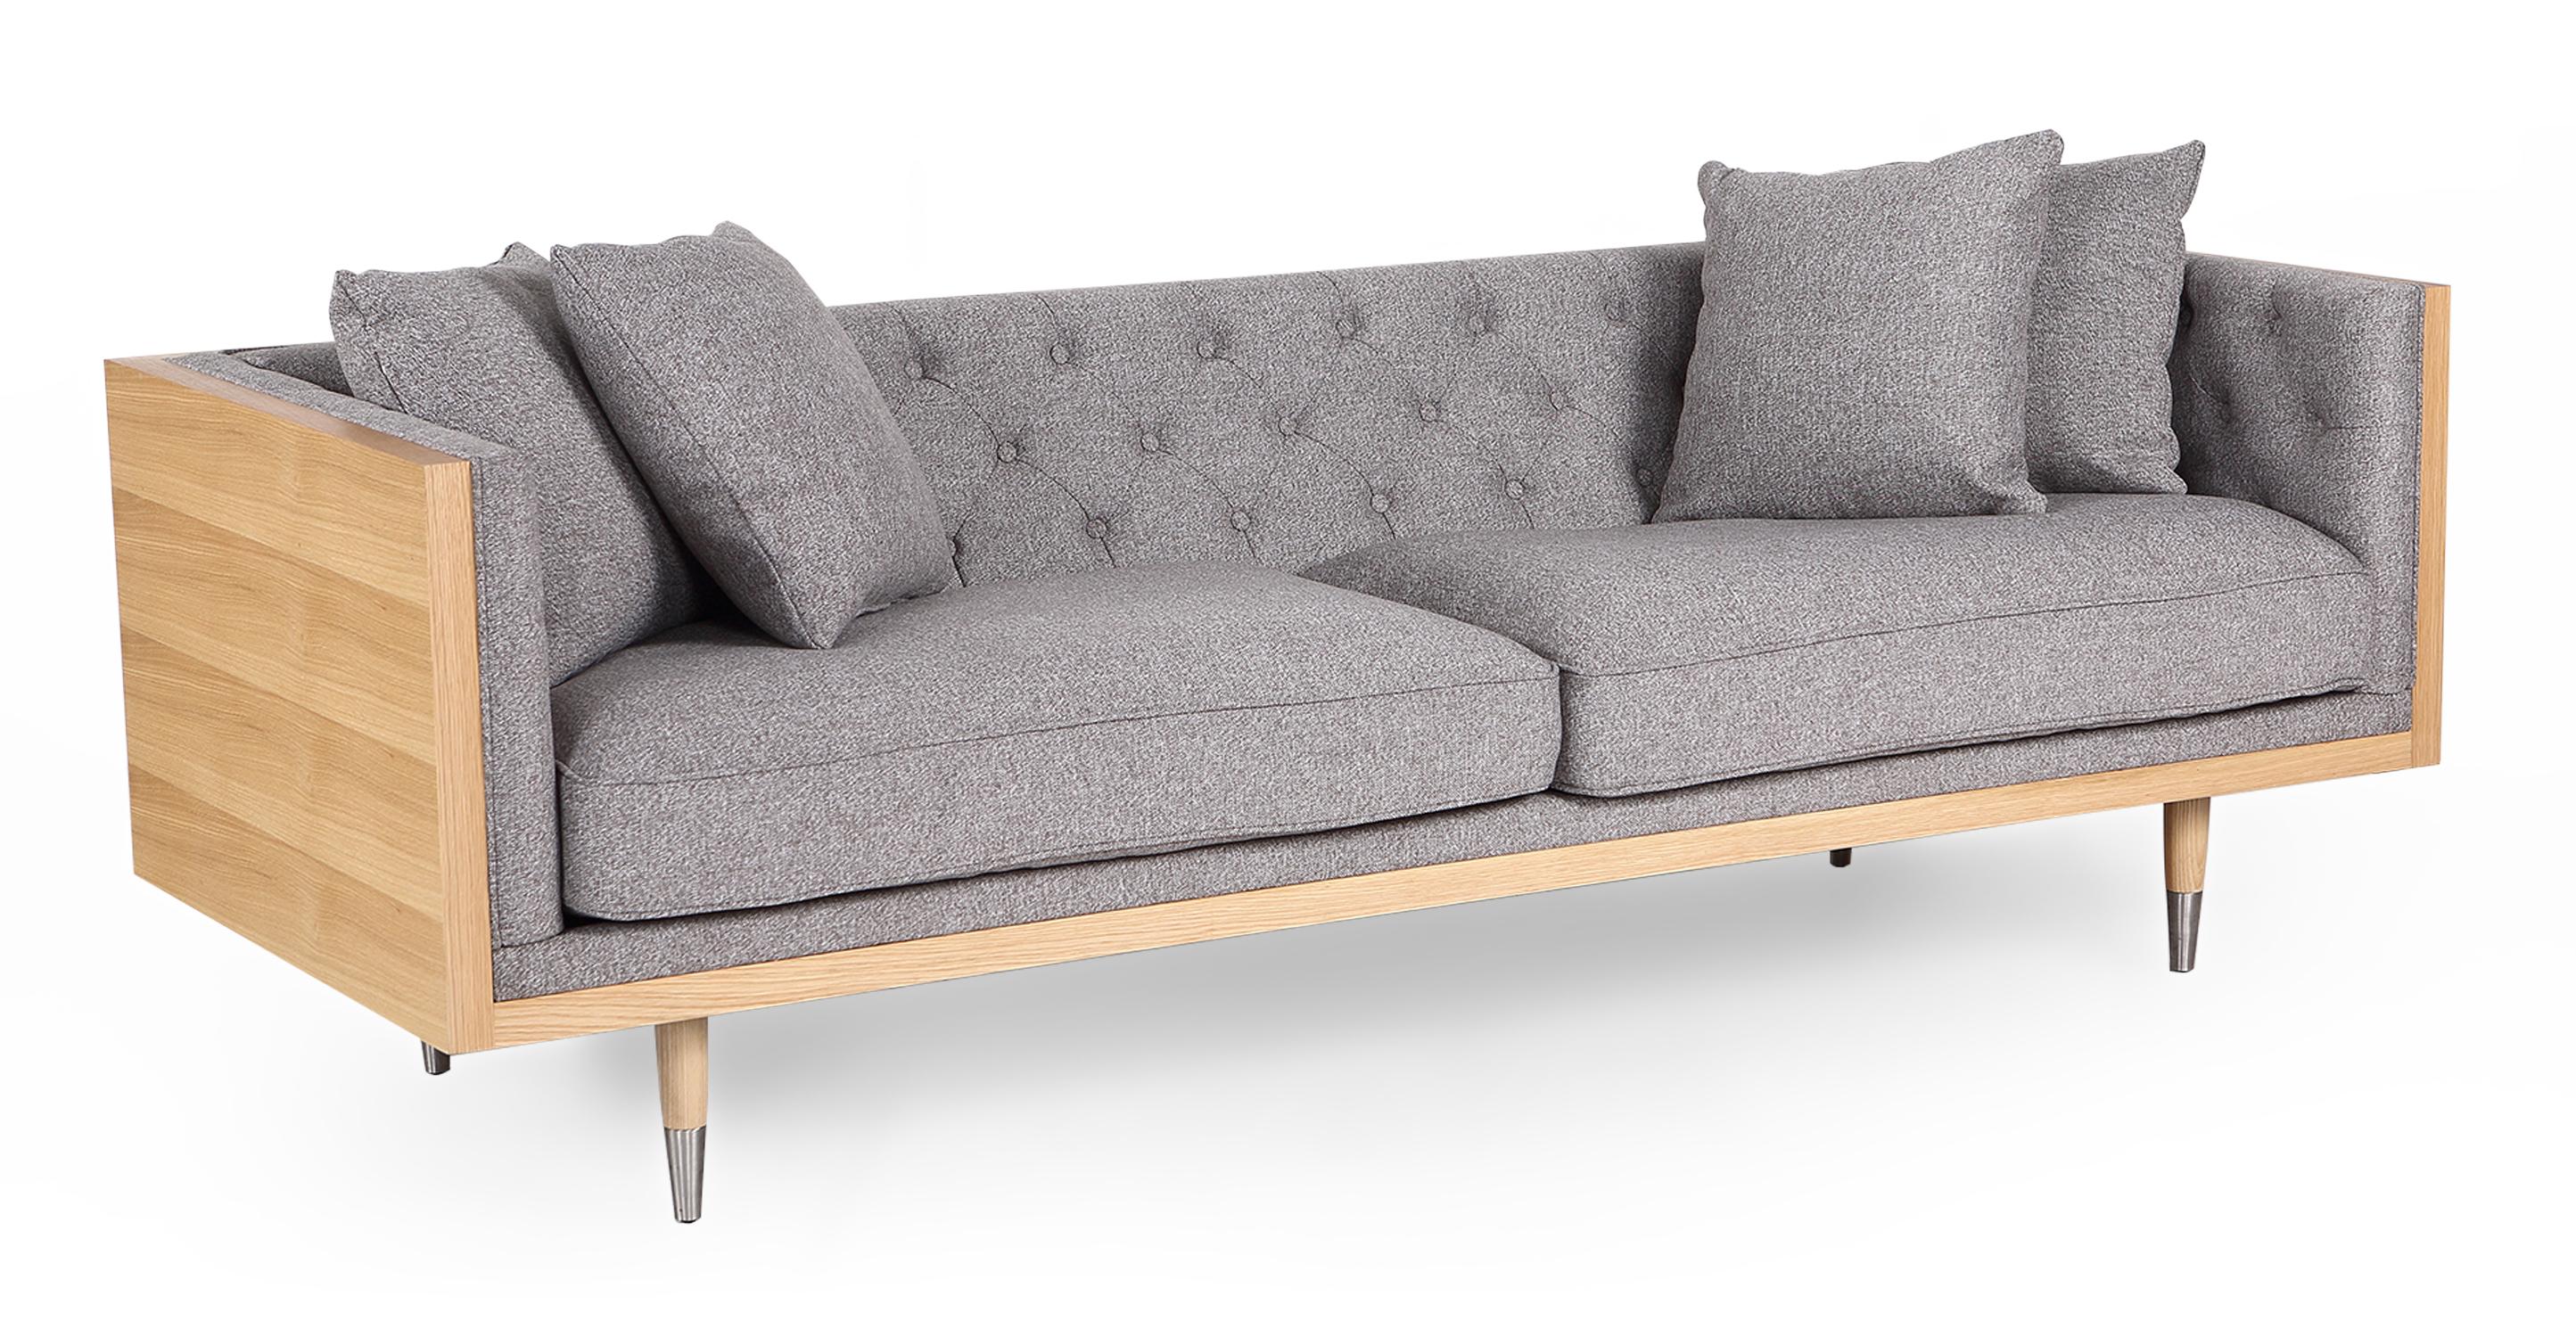 "Woodrow Neo 87"" Fabric Sofa, Ash/Urban Pebble"